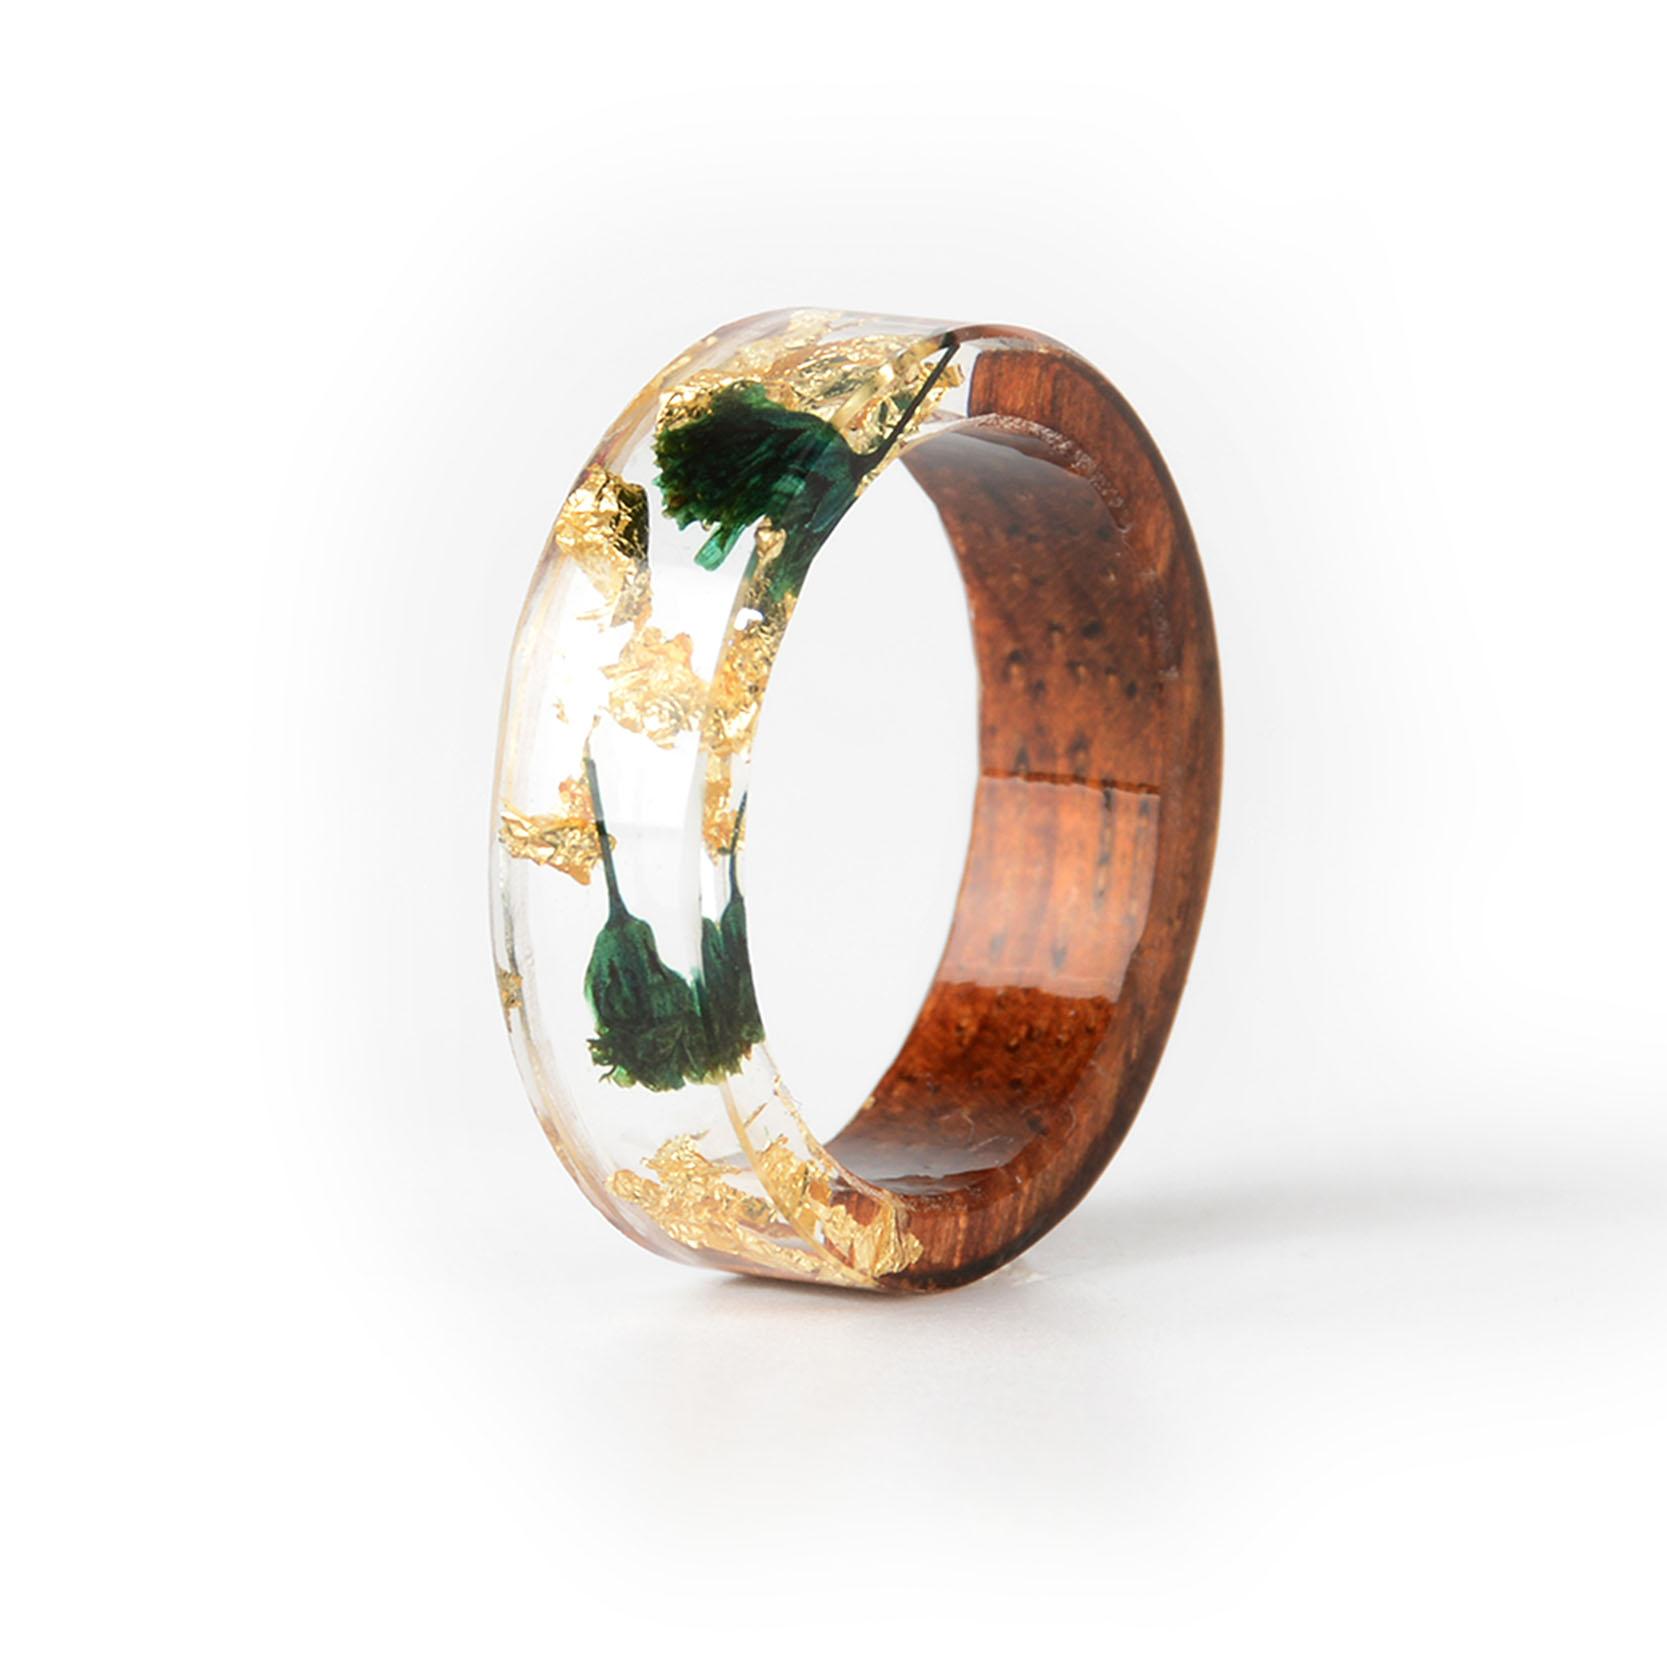 Handmade Wood Resin Ring Many Styles 26